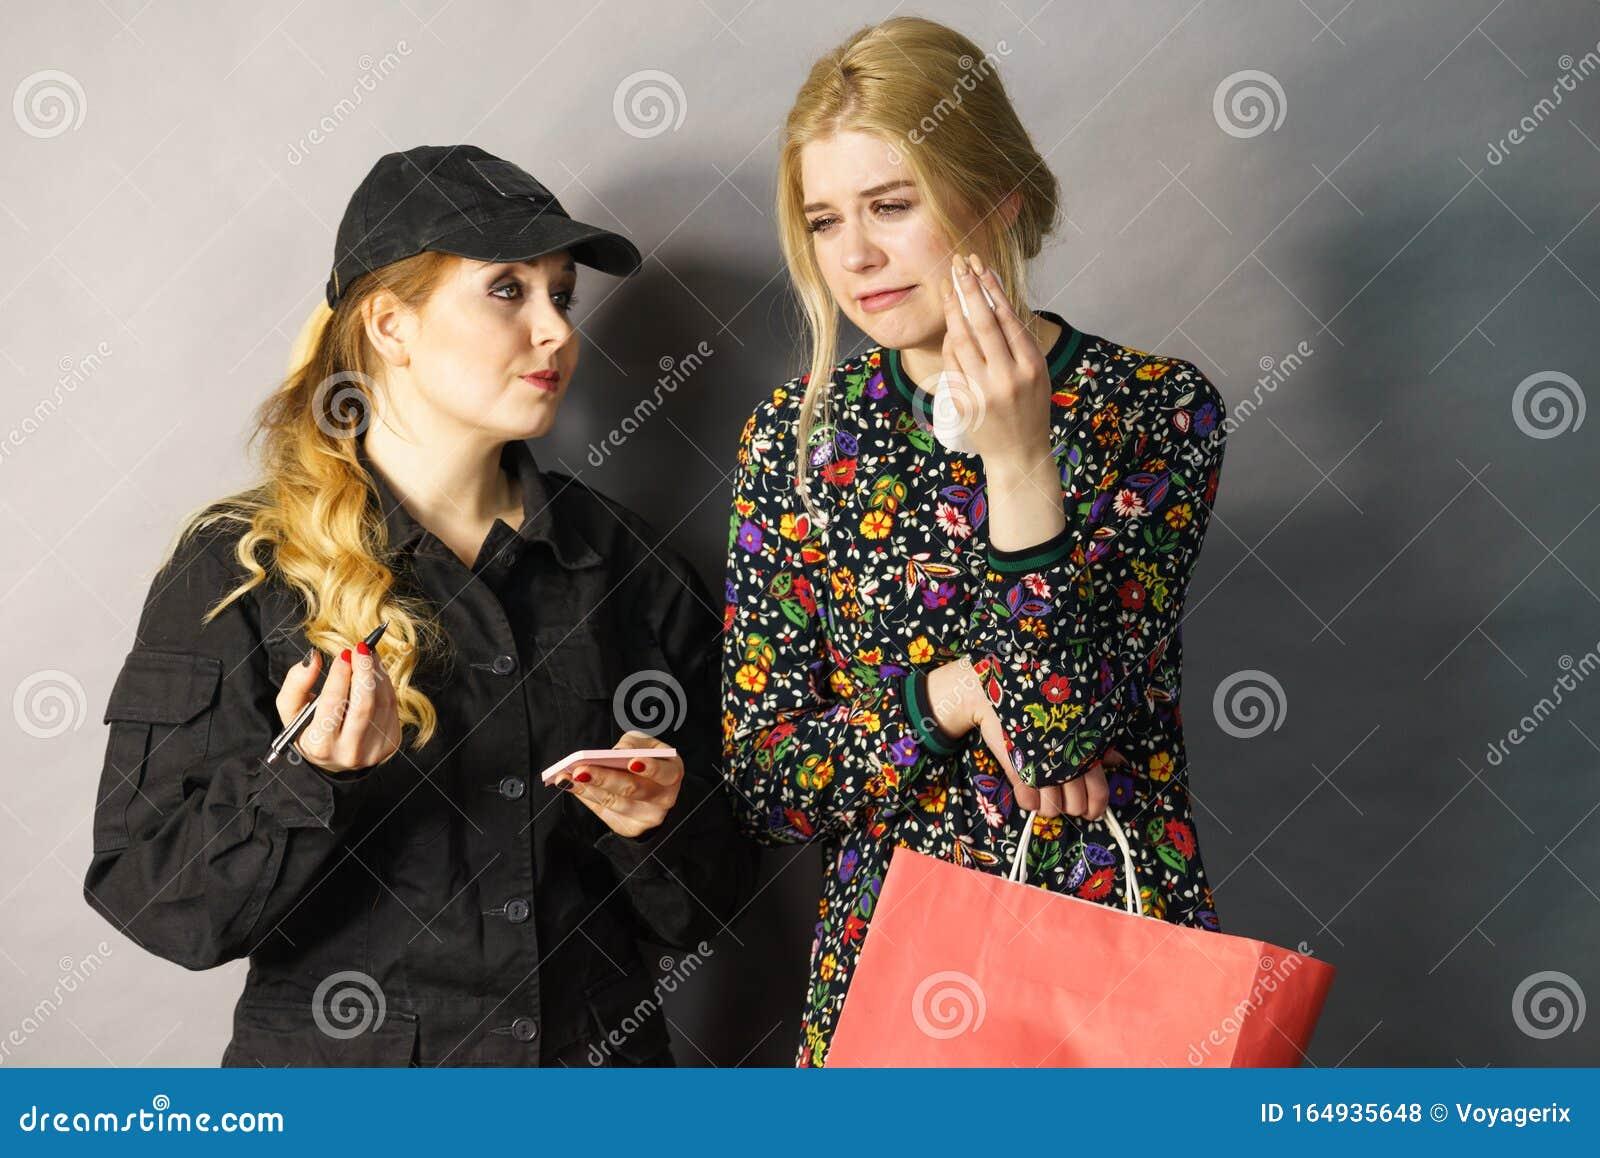 girl using vibrator squirts